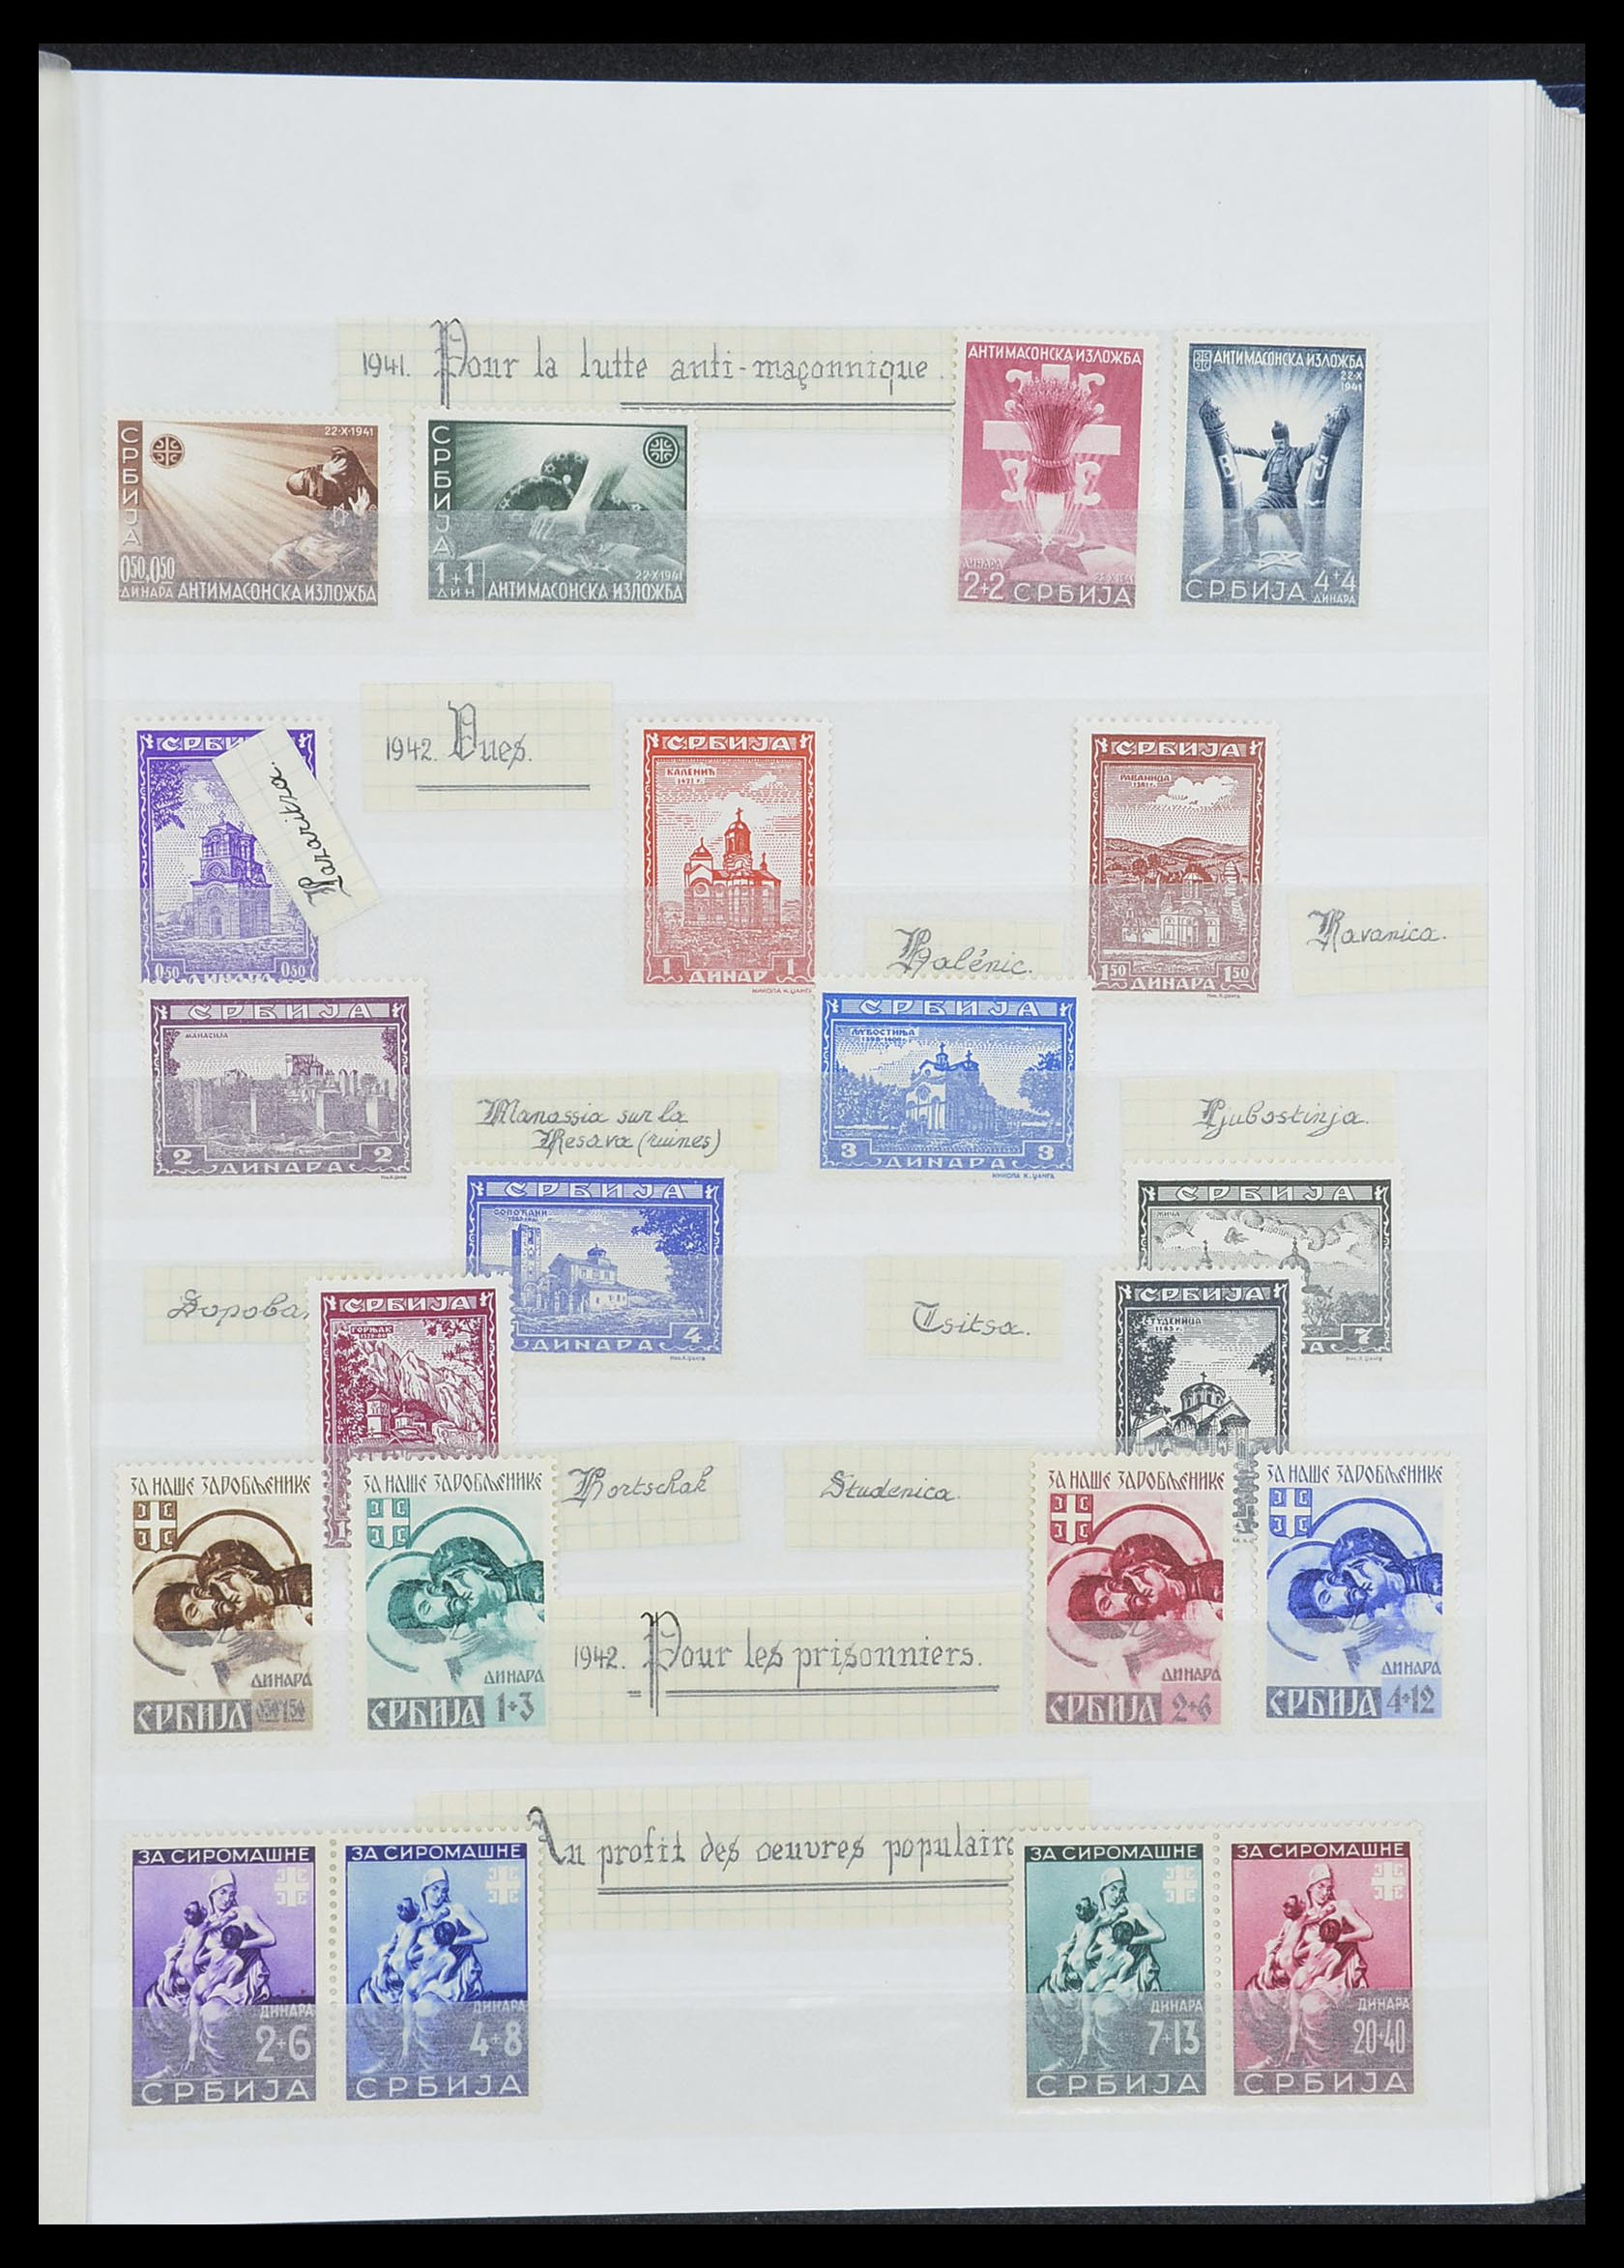 33850 015 - Postzegelverzameling 33850 Duitse bezettingen 2e wereldoorlog 1939-19